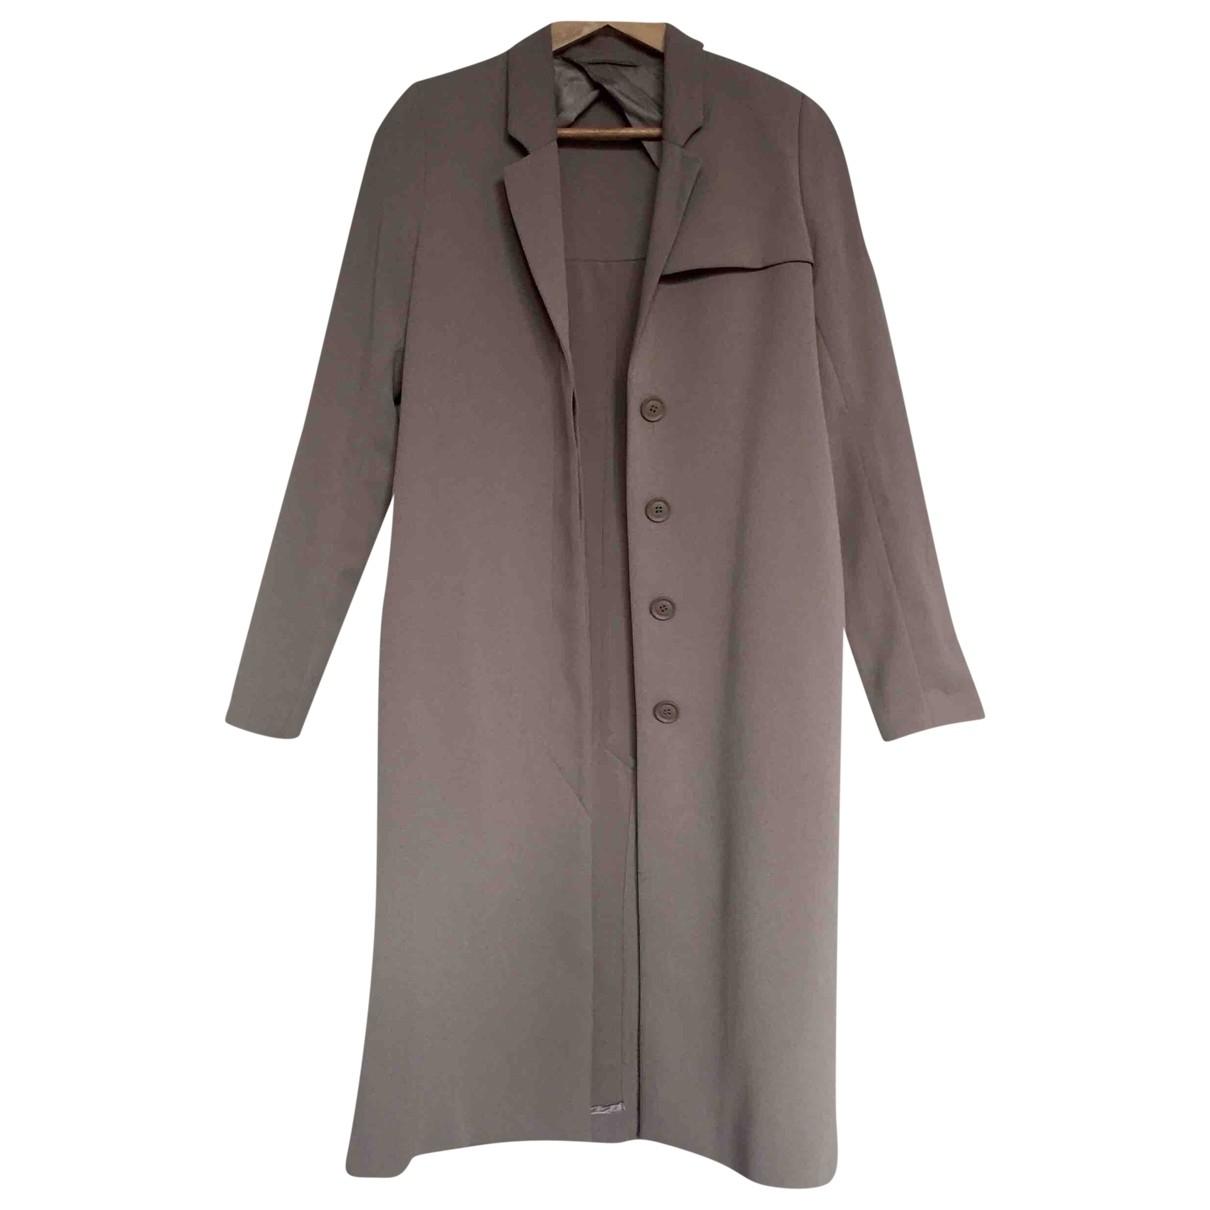 & Stories \N Beige Trench coat for Women 34 FR